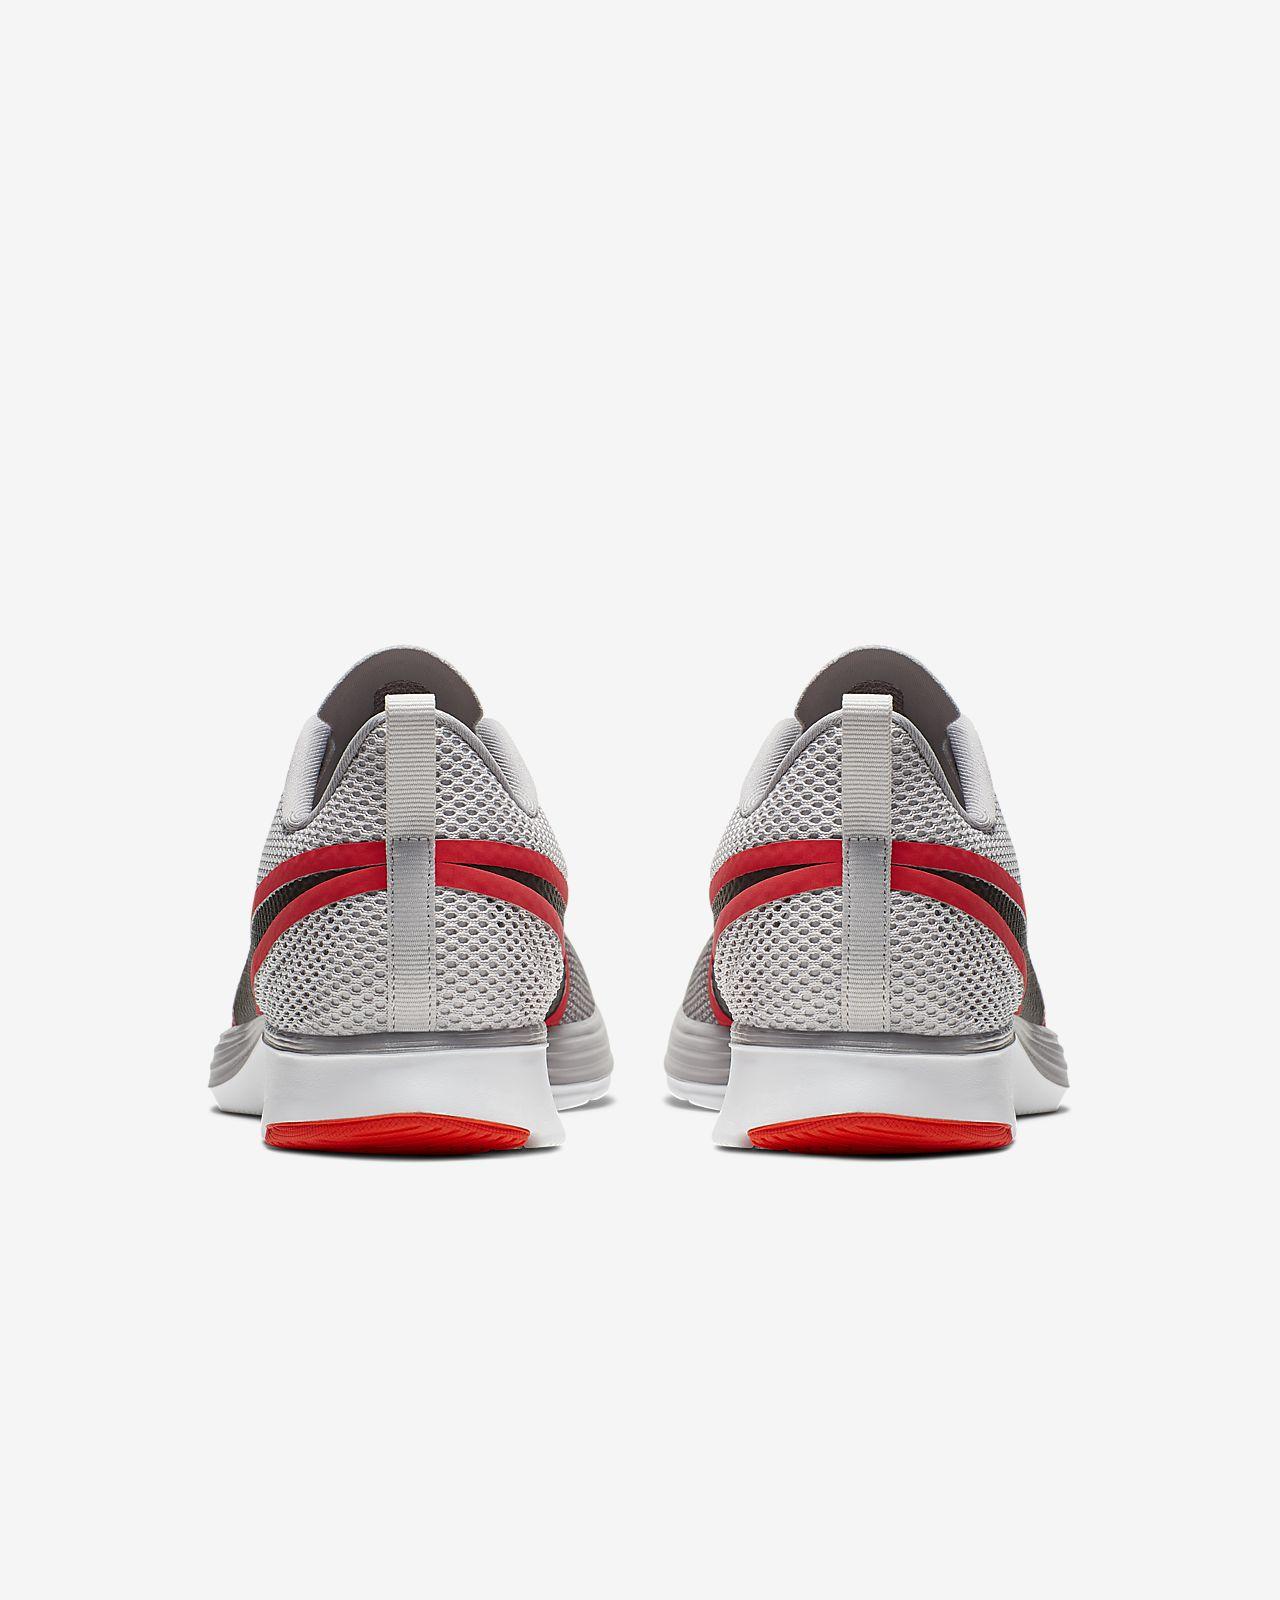 Chaussure 2 Strike Running De Nike Pour Zoom HommeBe LzSMjqUpVG